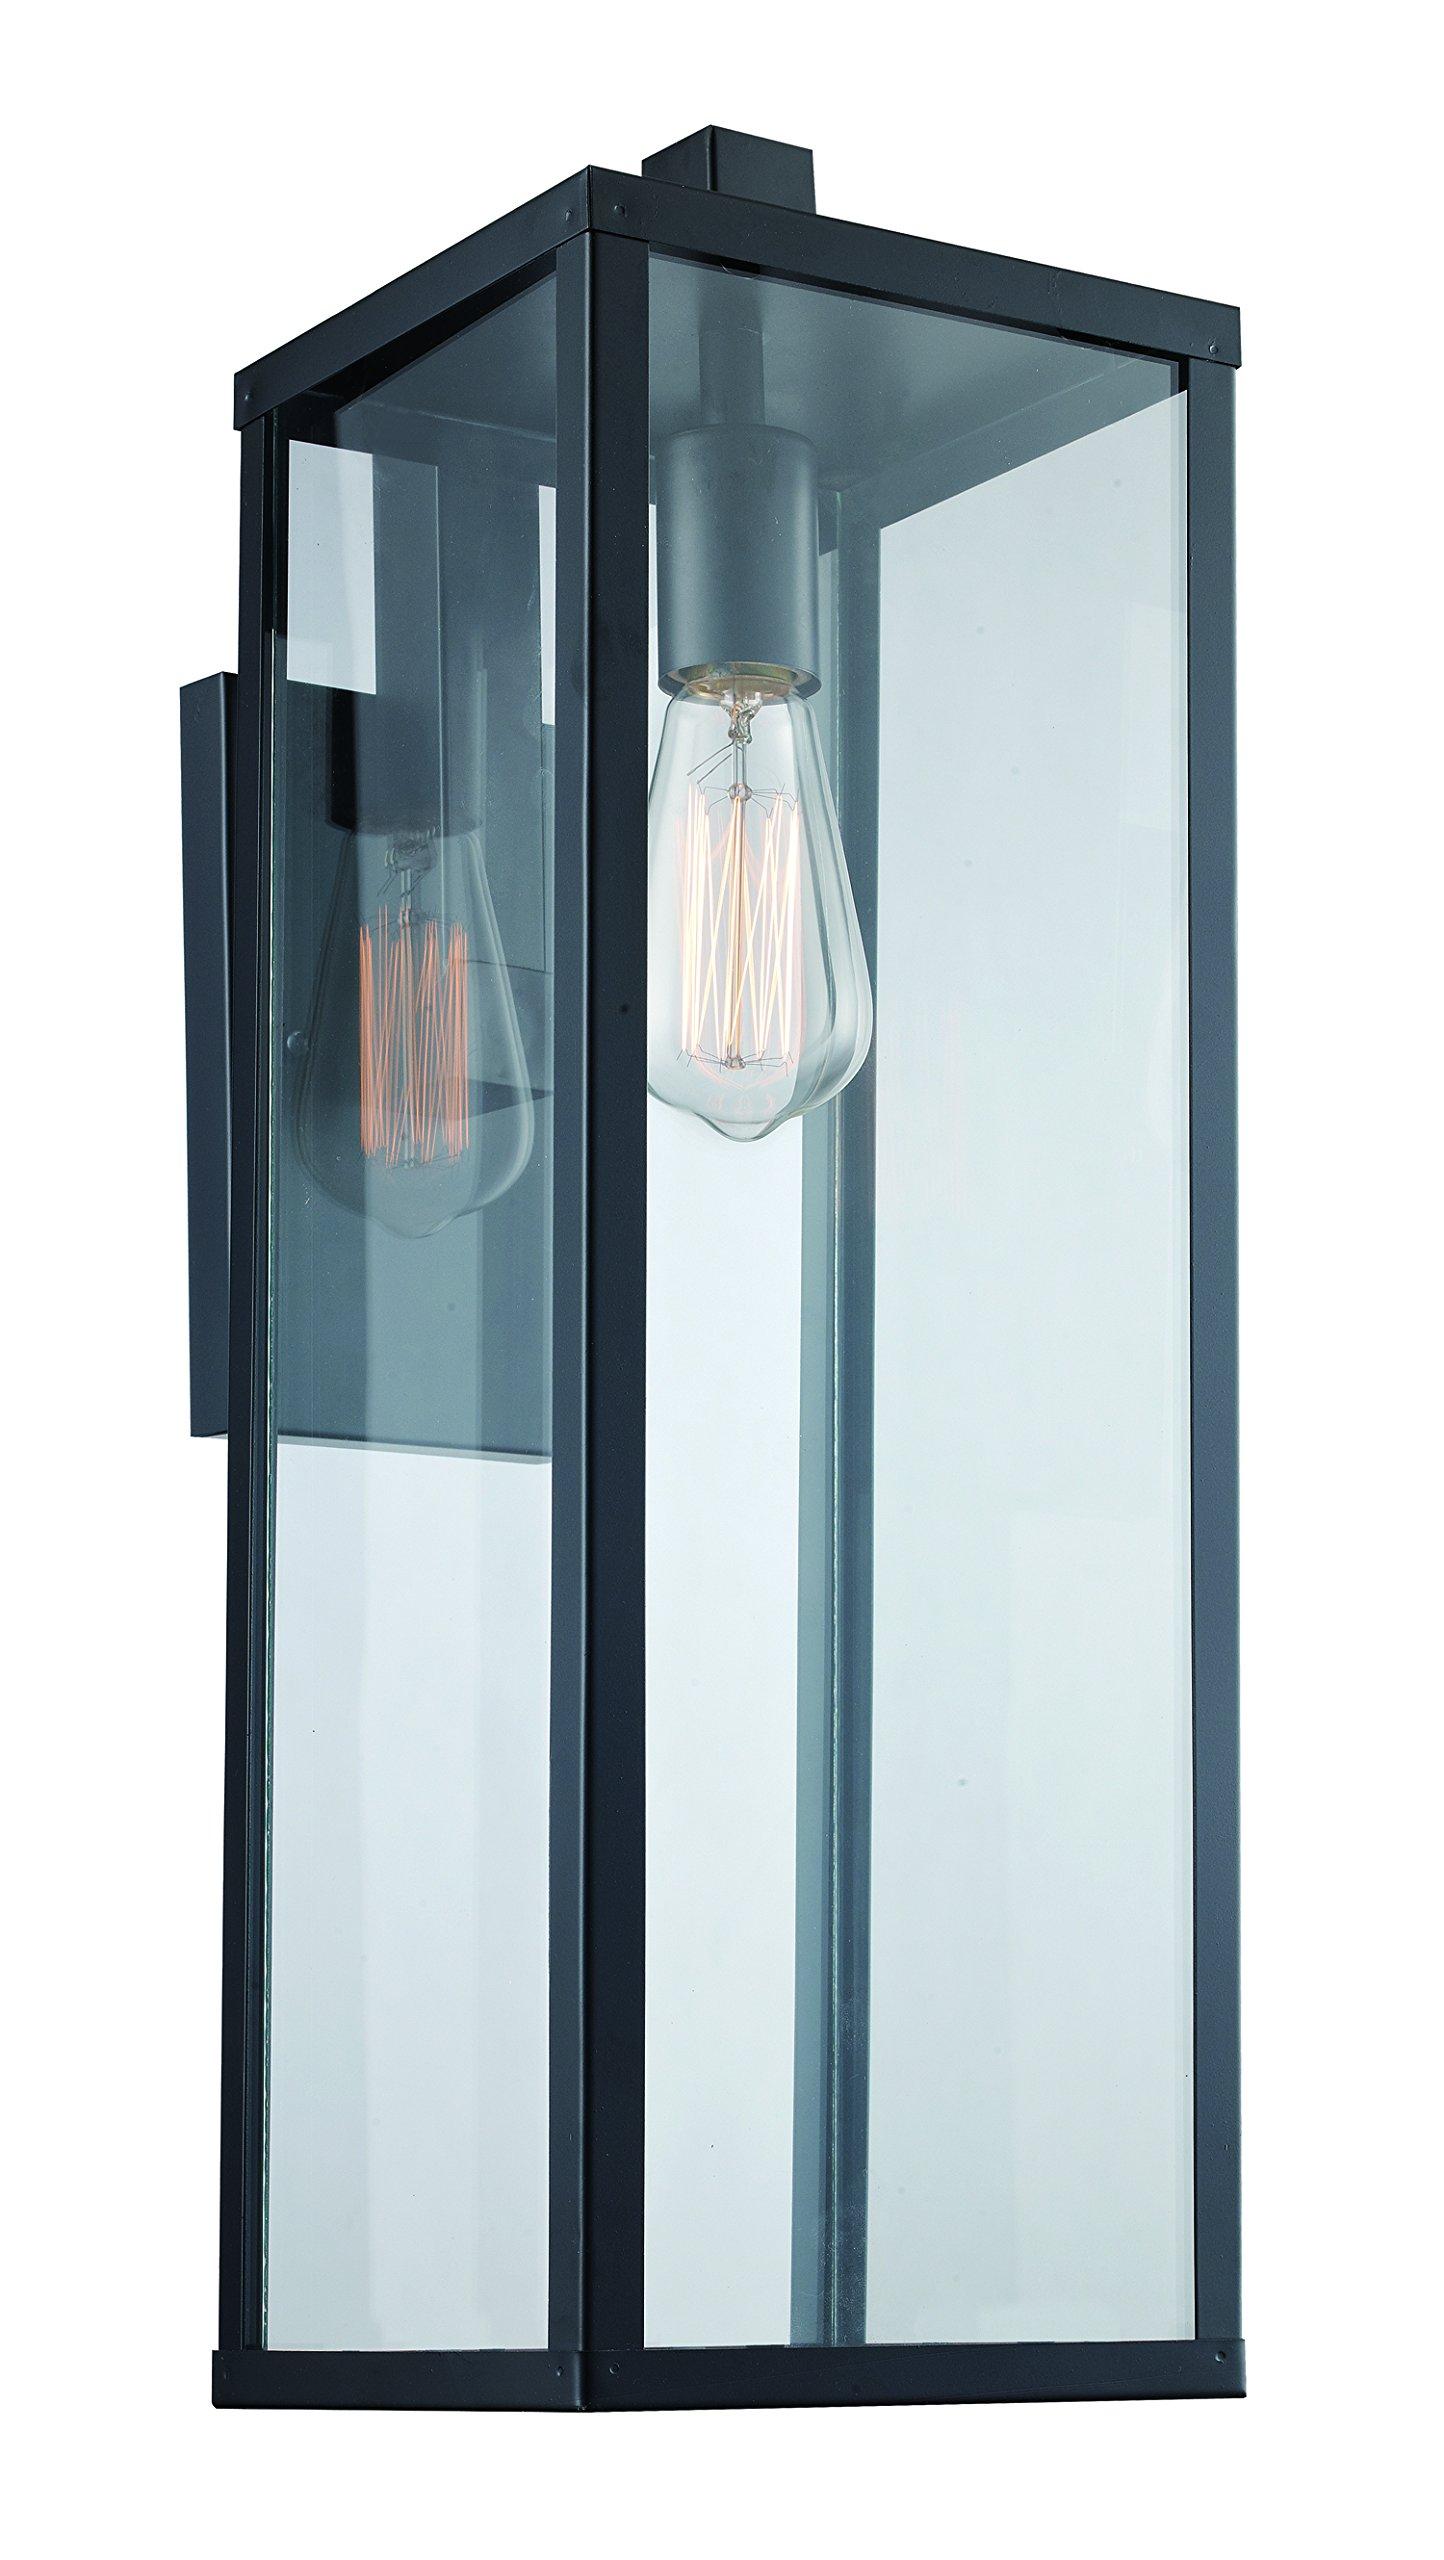 Trans Globe Lighting 40752 BK Oxford Industrial Wall Lantern, 22.5'', Outdoor Black